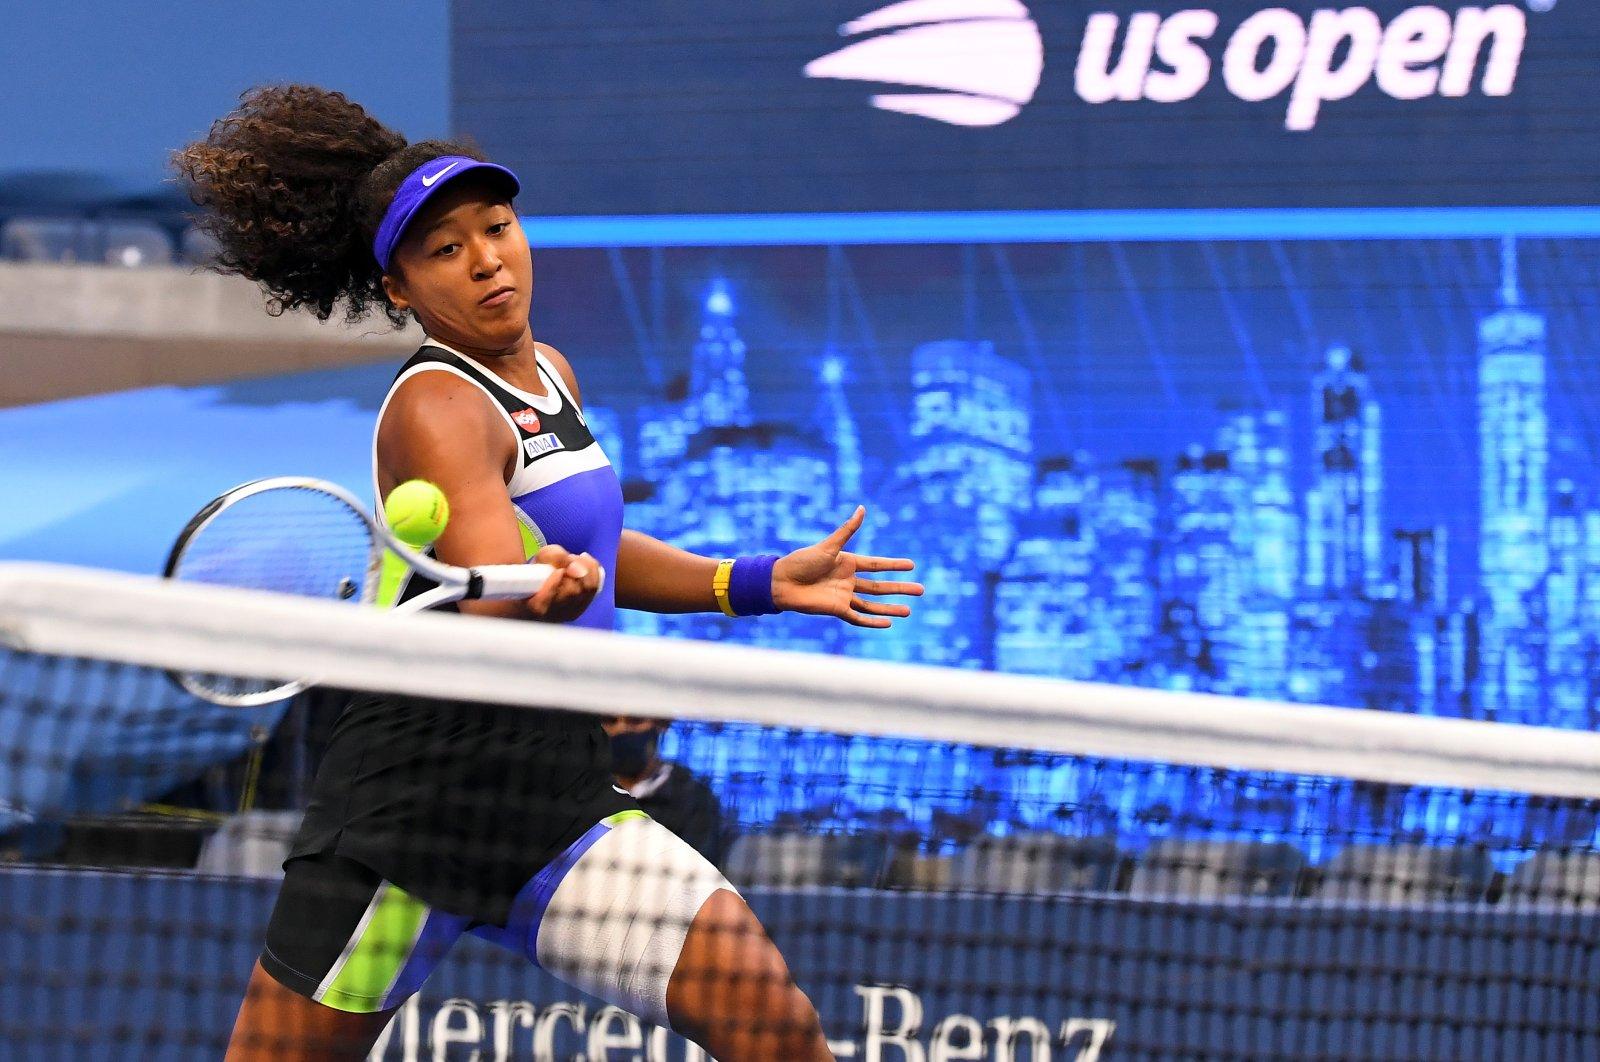 Naomi Osaka hits the ball during women's singles final match, in New York, New York, U.S., Sept. 12, 2020.  (REUTERS Photo)